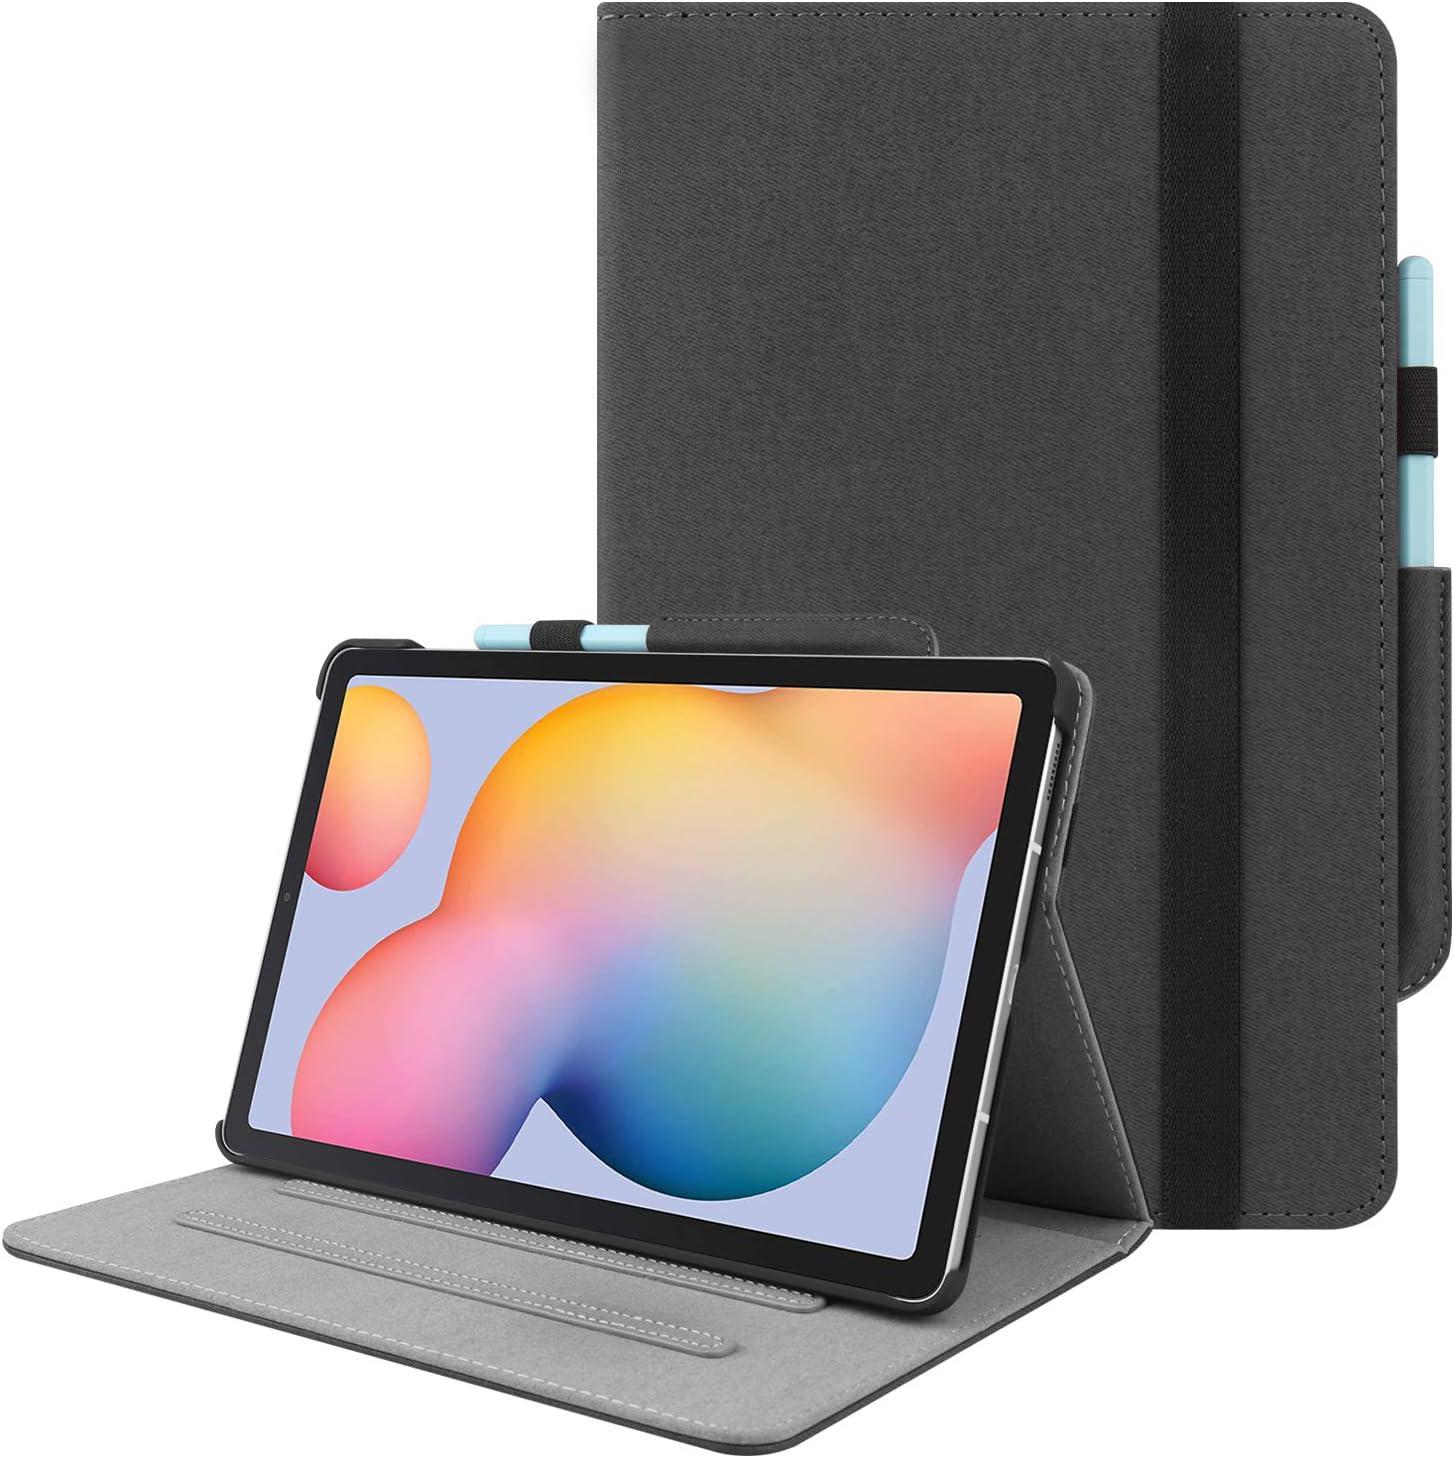 HoYiXi Coque pour Samsung Galaxy Tab S6 Lite 10.4 2020 Mince Cuir Smart Cover